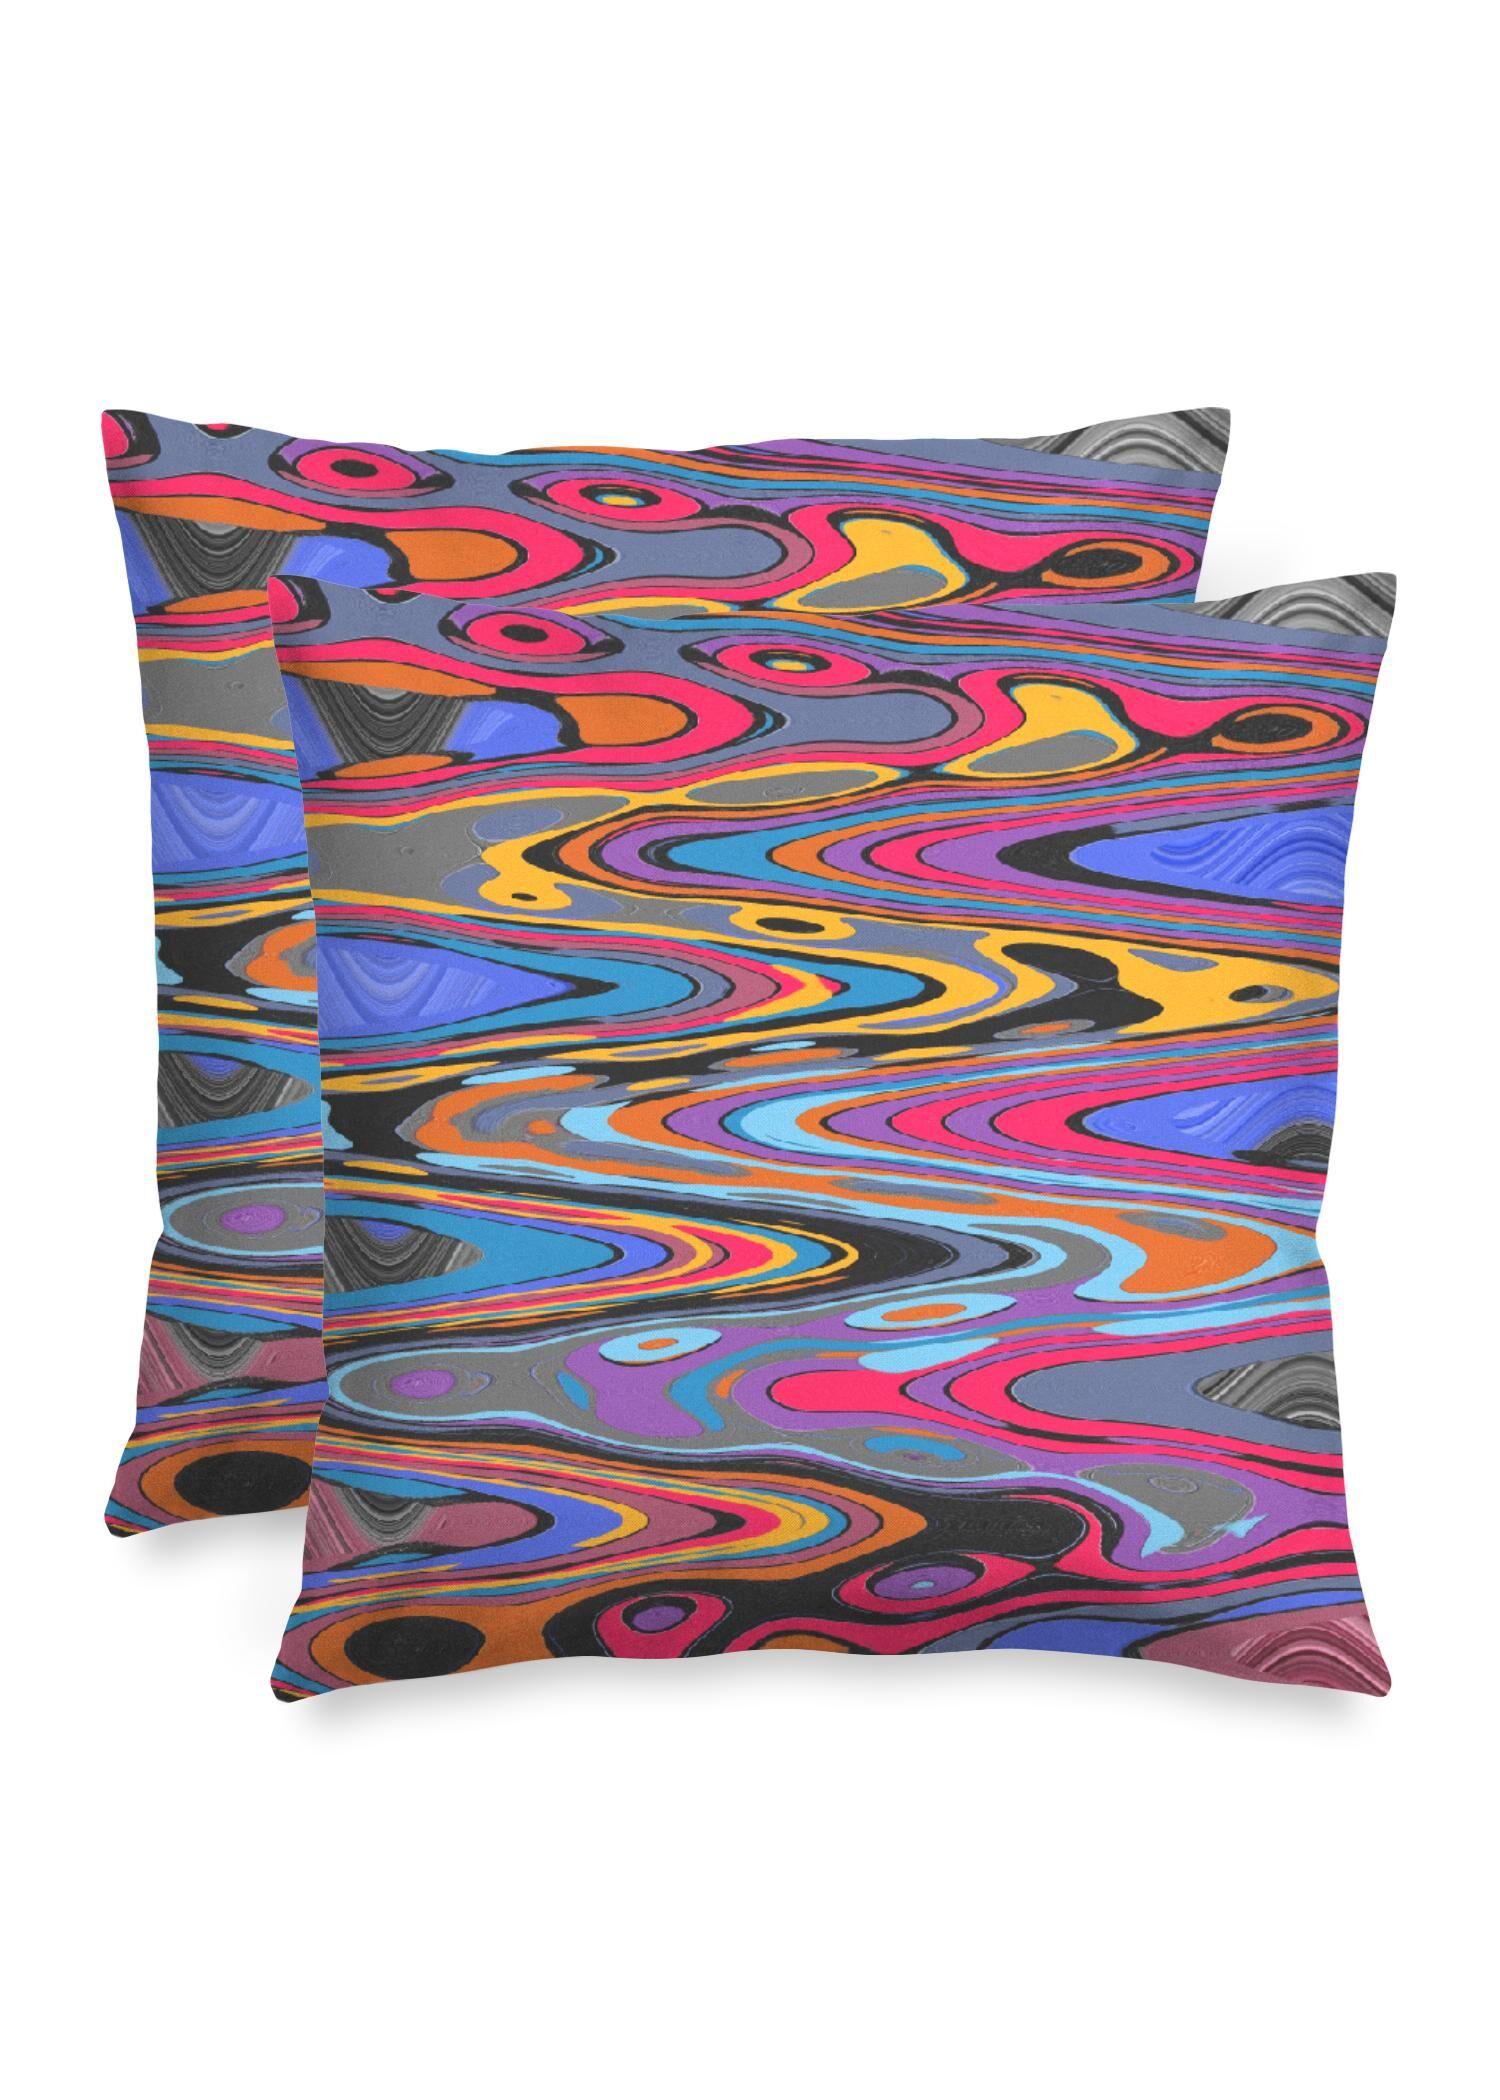 "VIDA Square Pillow - Vibration Pop Music 2021 by VIDA Original Artist  - Size: Luster / 16"" / Set"